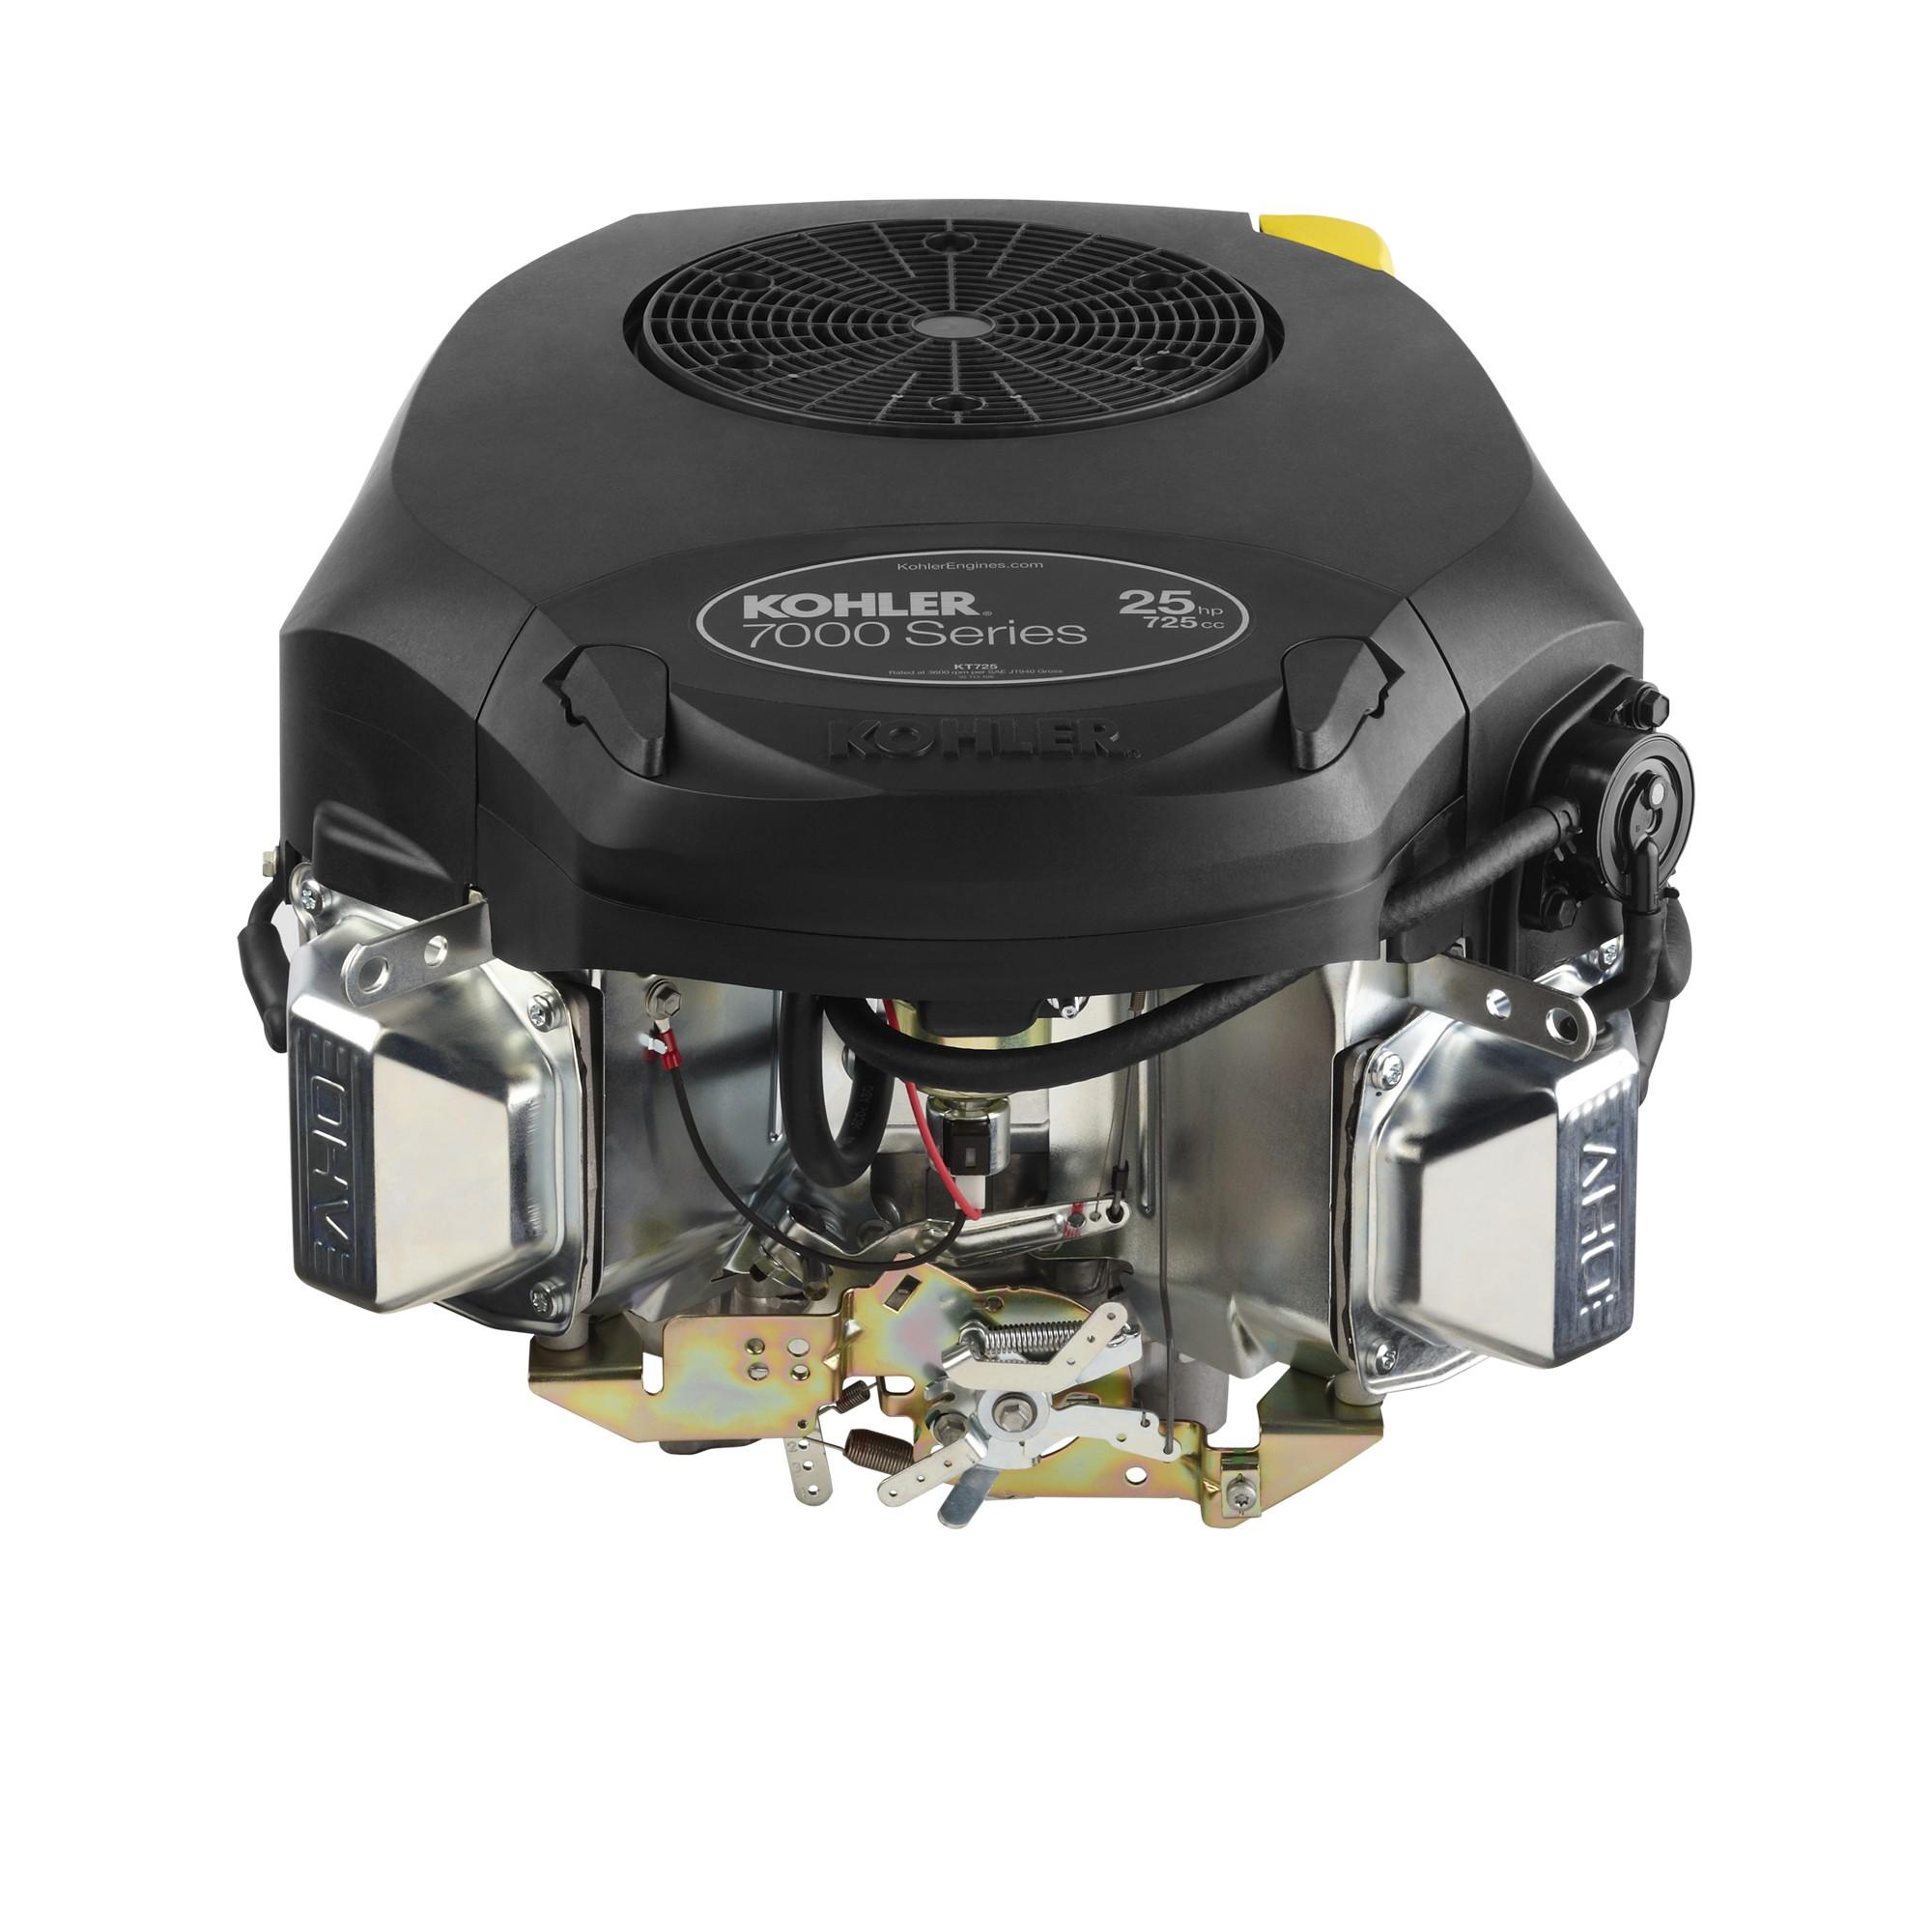 Kohler 7000 Generator Wiring Diagram Posts 4cm21 Engines Kt735 Series Product Detail To House